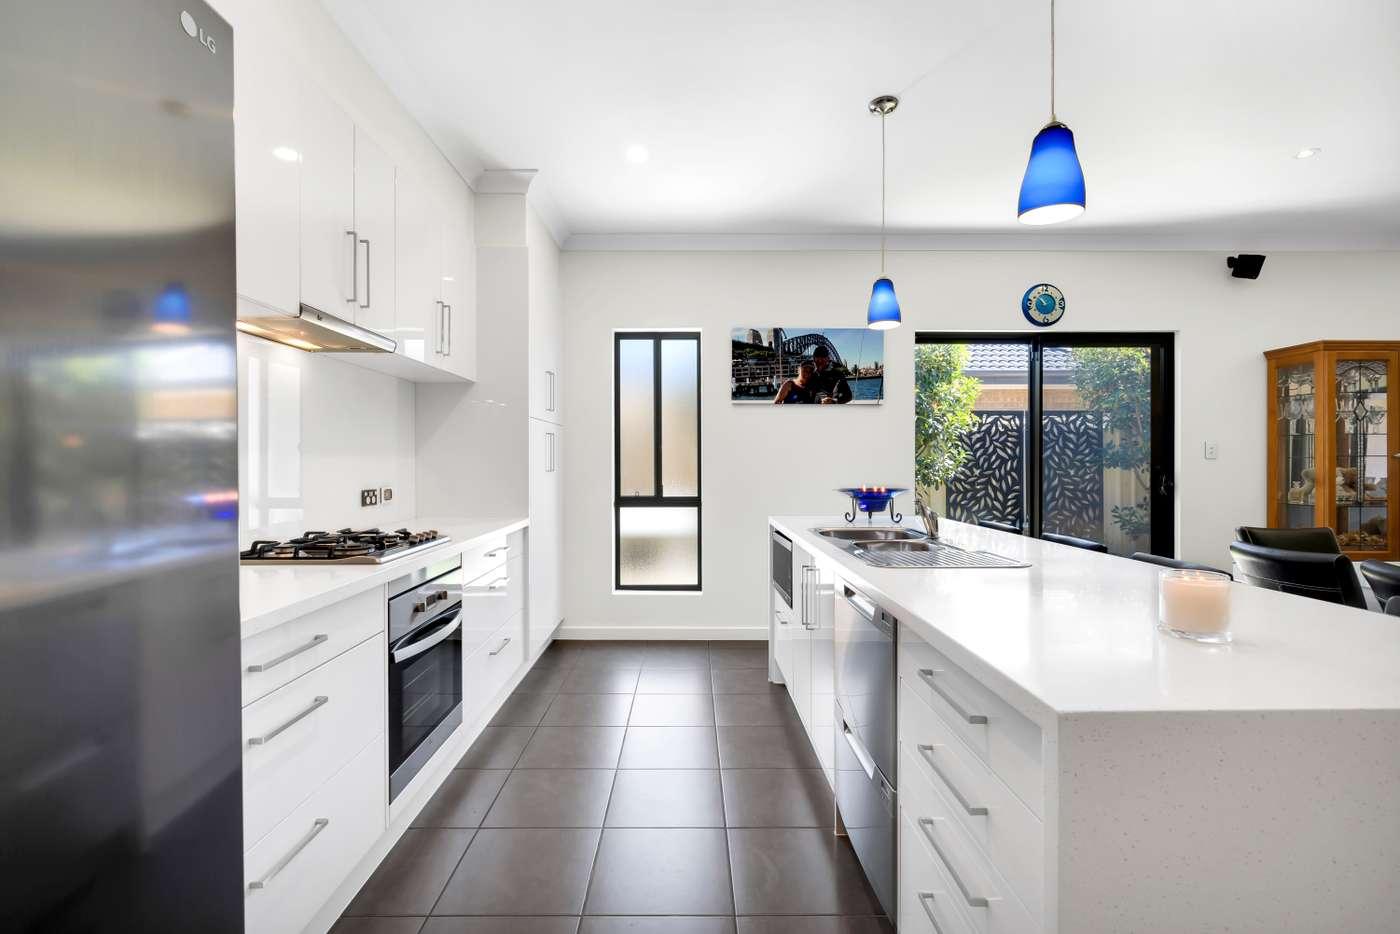 Fifth view of Homely house listing, 14 Gordon Terrace, Morphettville SA 5043